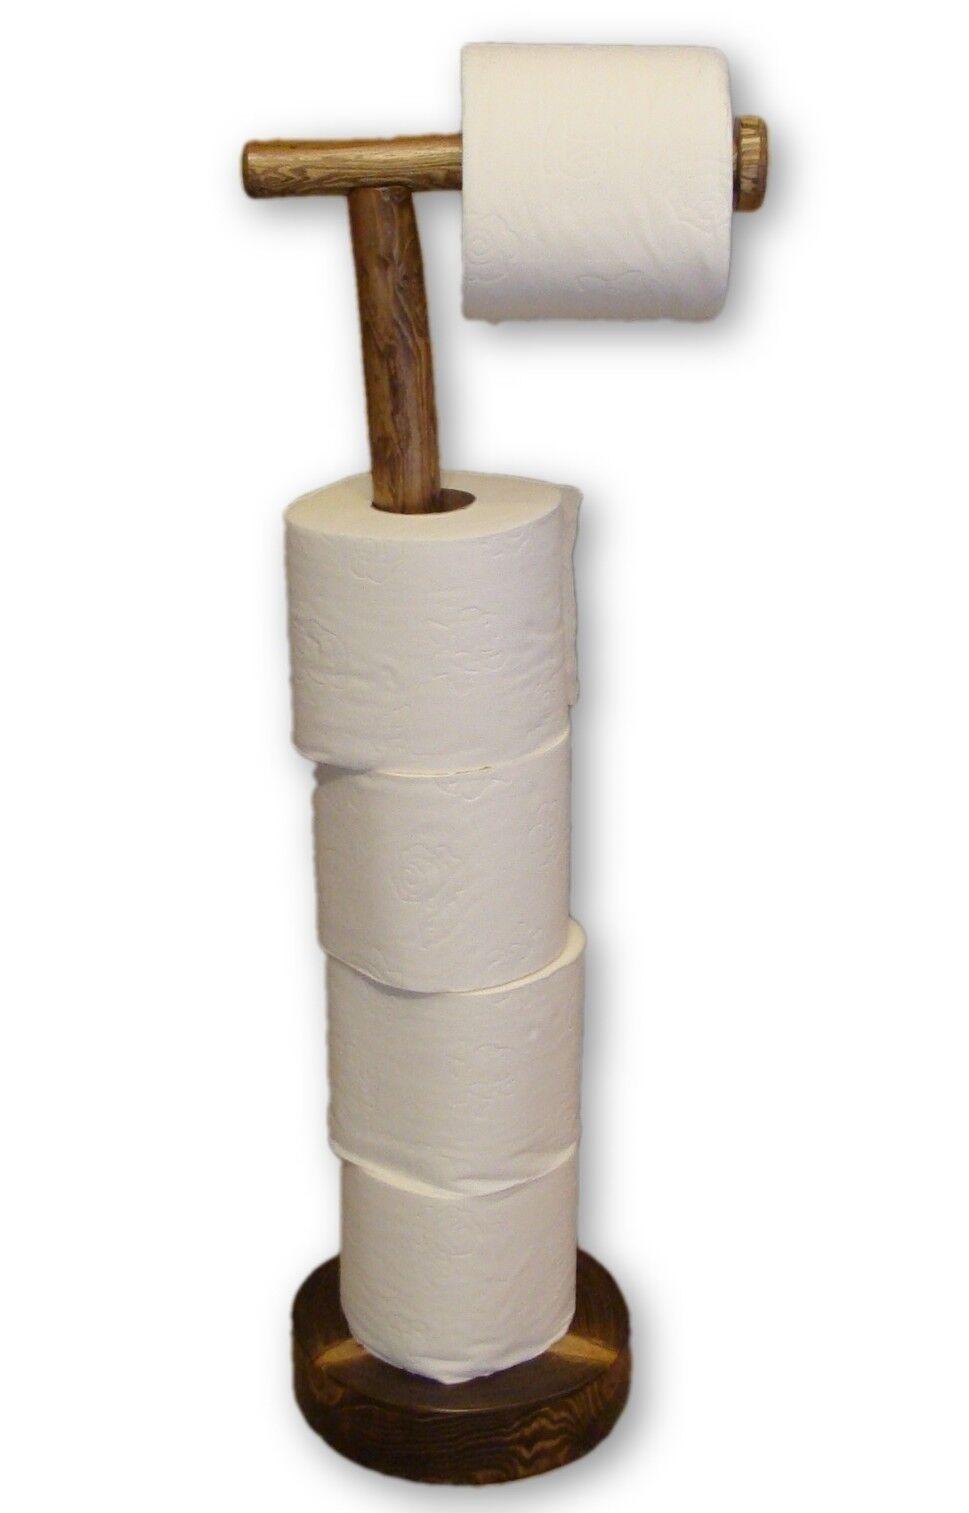 Free Standing Antique Bathroom Pedestal 4 Storage Toilet Paper Holder Wood Decor